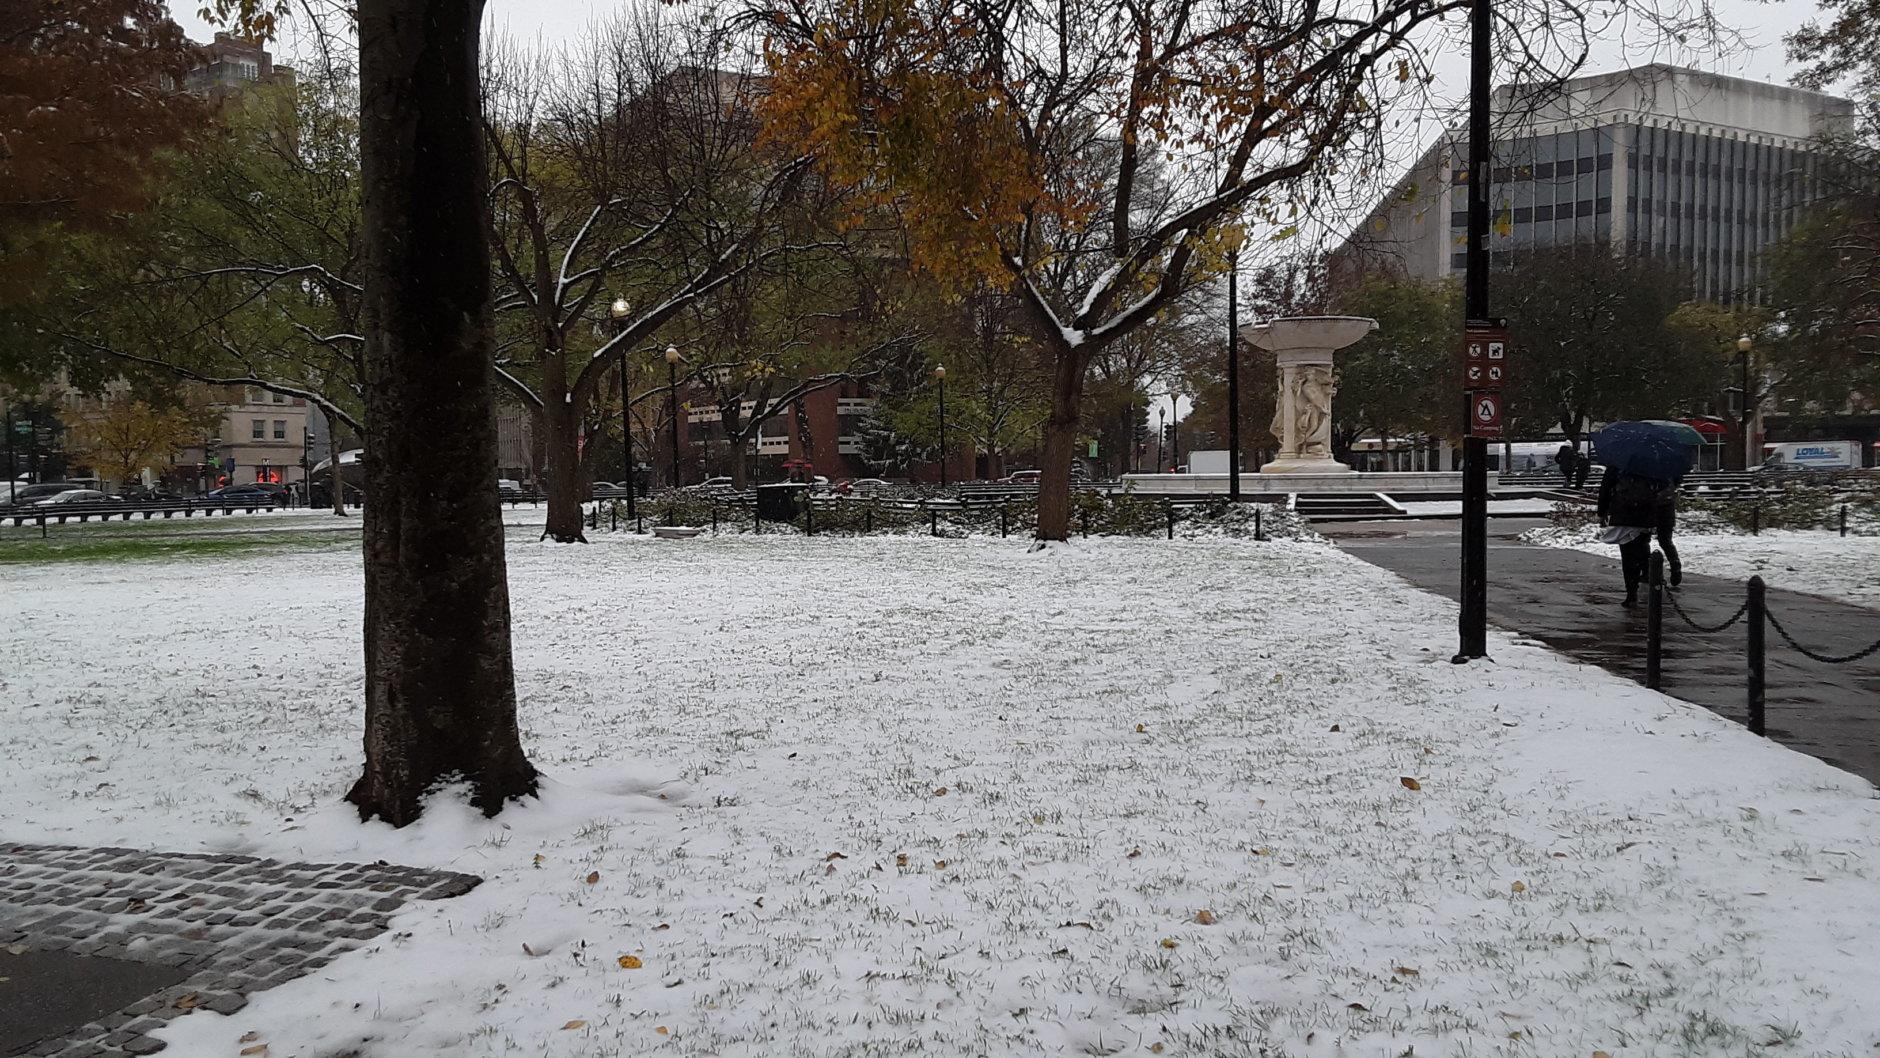 Snow falls around Dupont Circle in D.C. (WTOP/Lisa Winer)